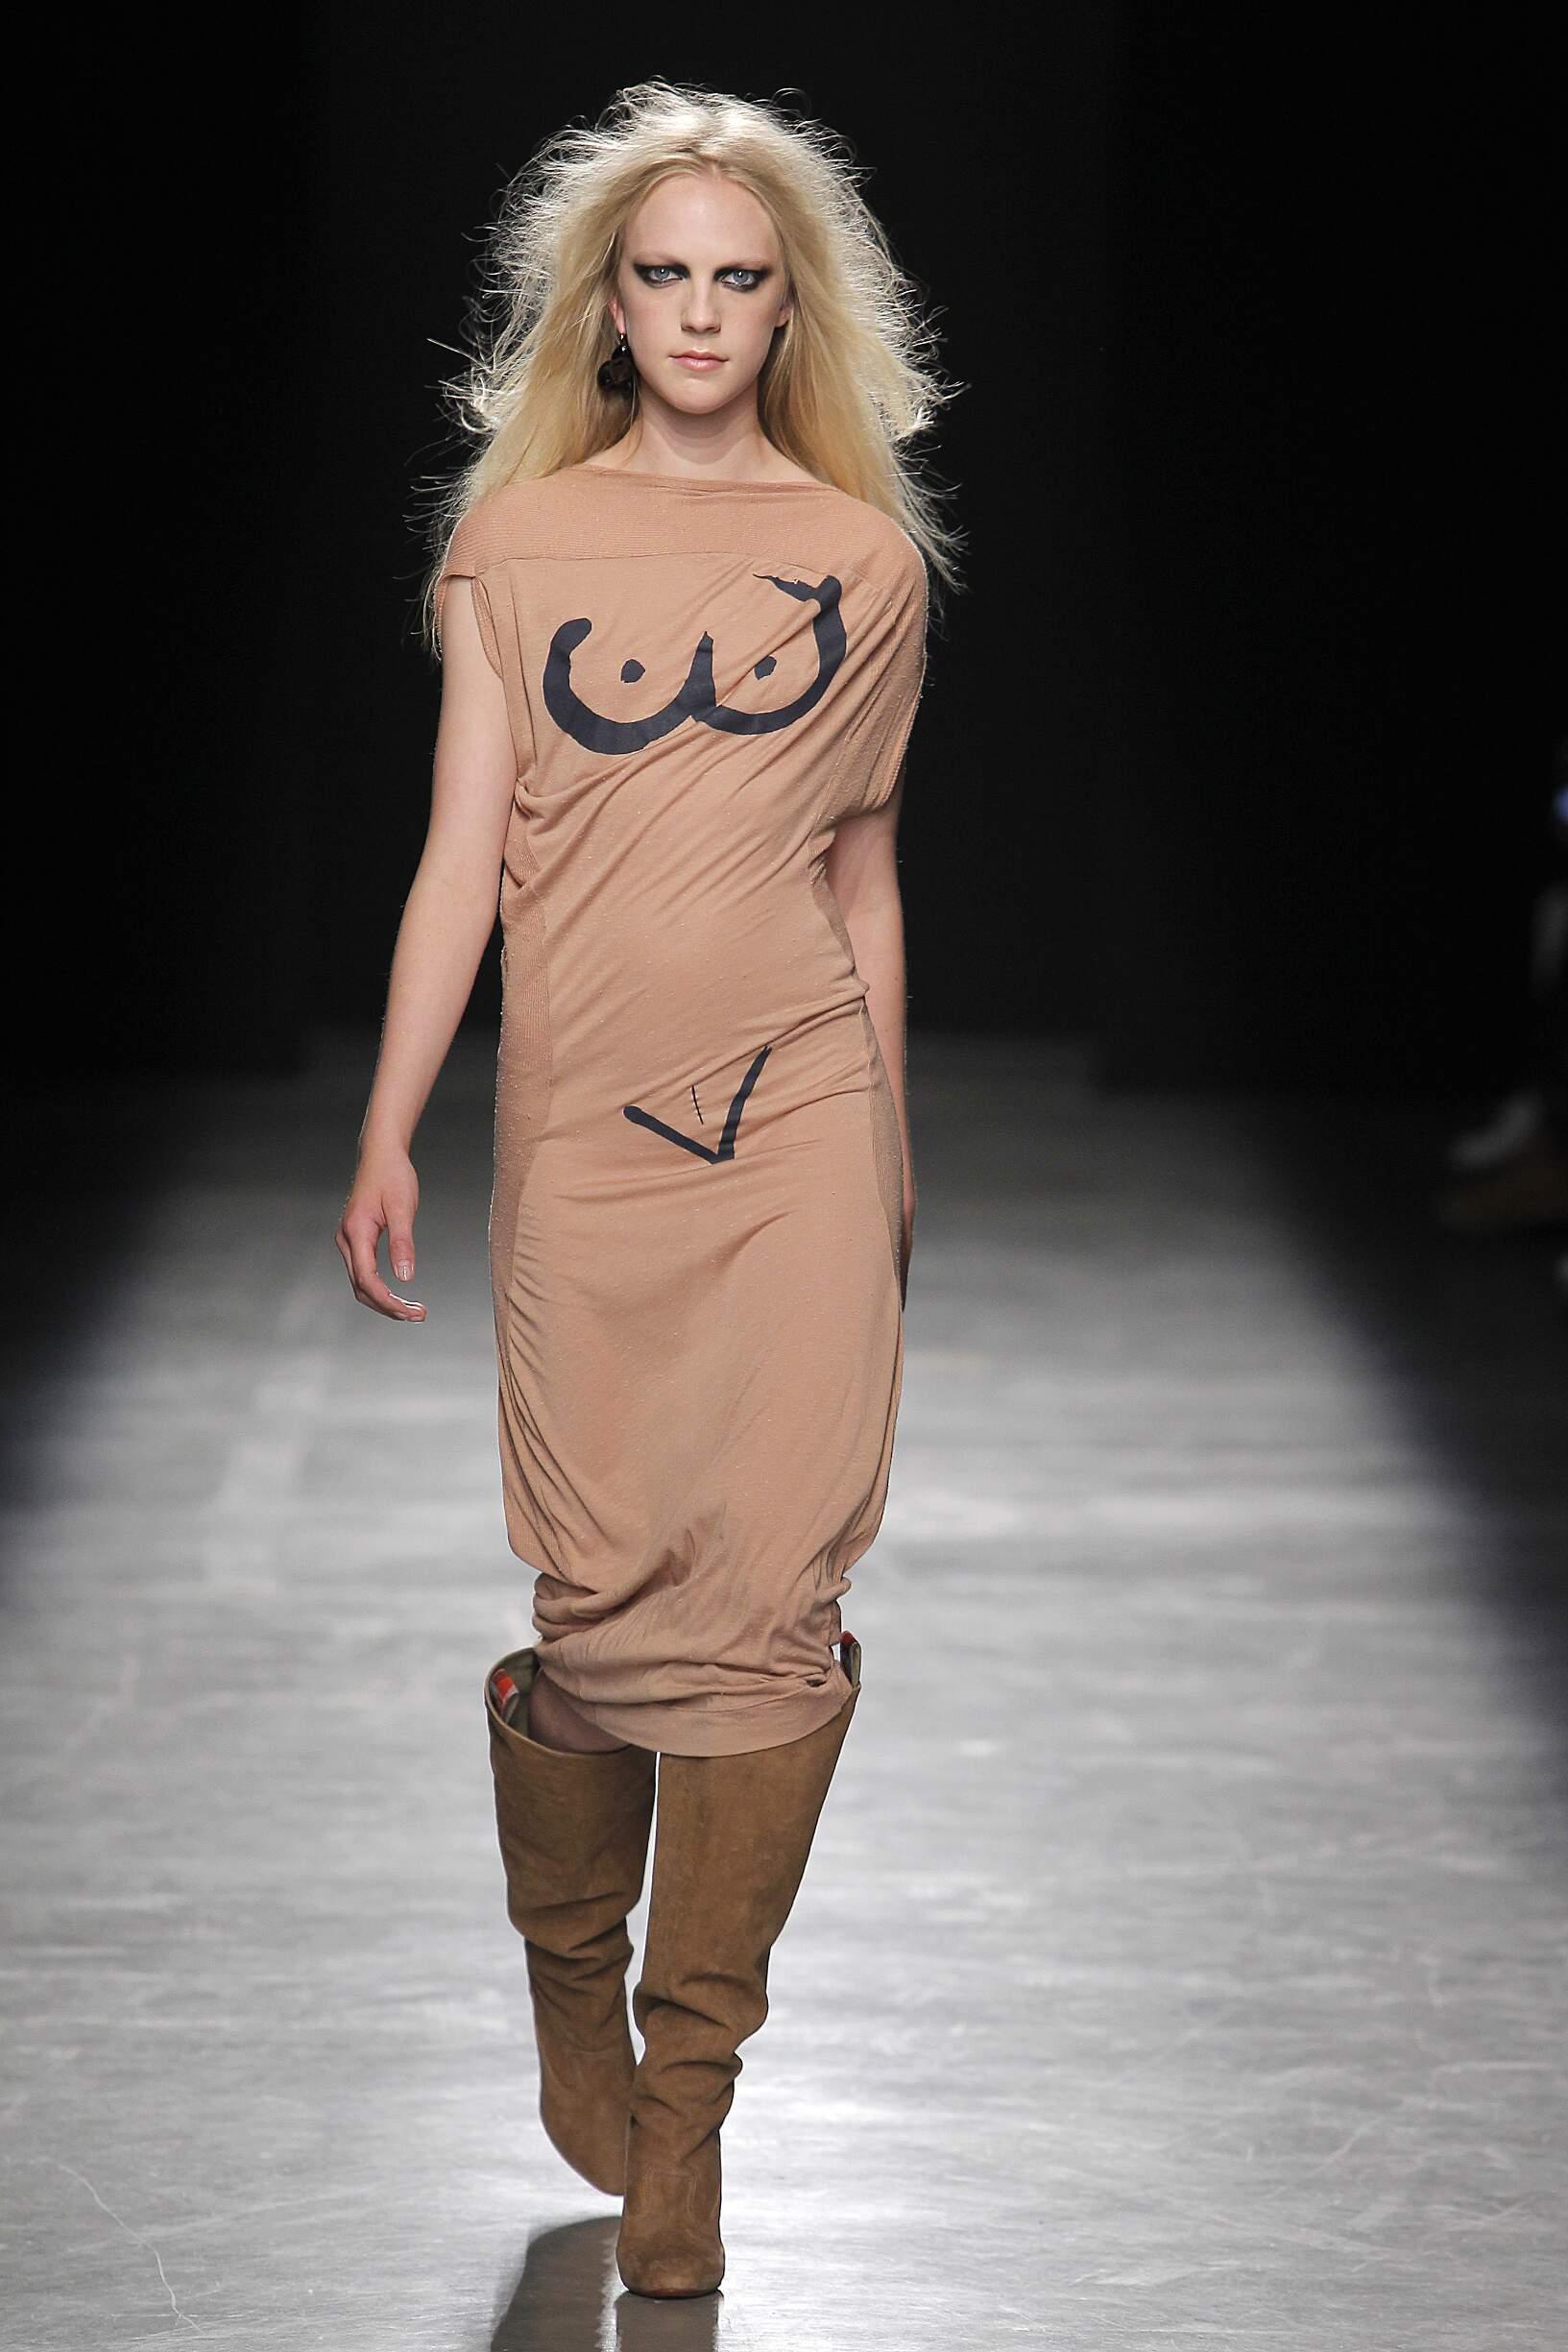 Andreas Kronthaler for Vivienne Westwood 2017 Paris